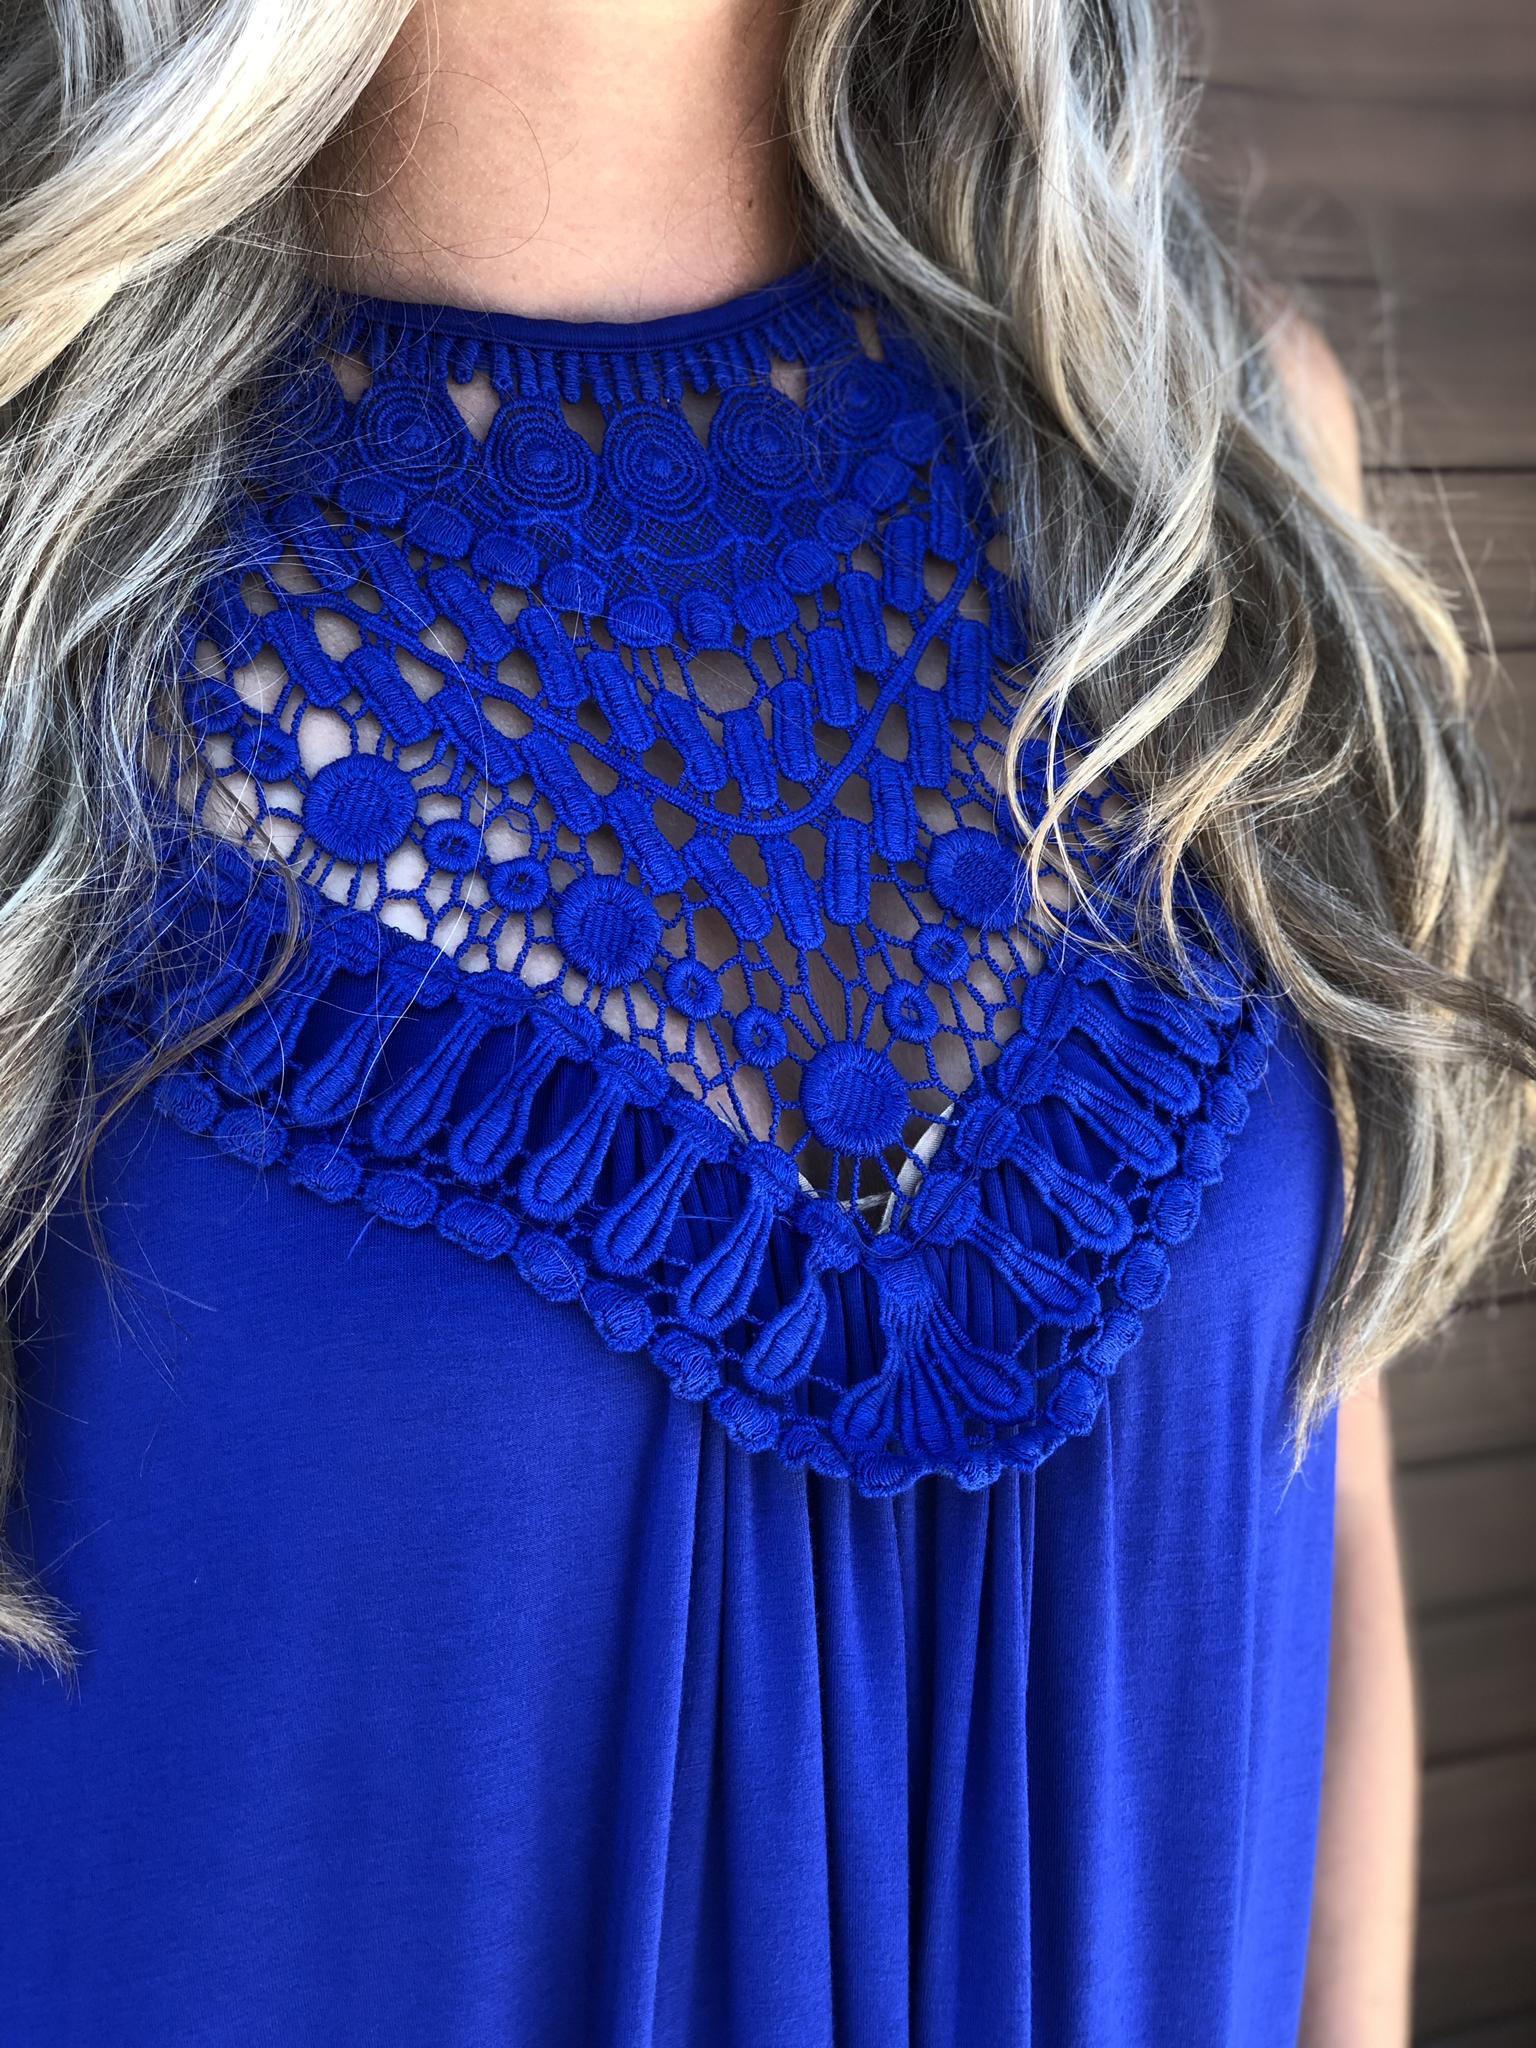 The Ponteix Dress - Blue